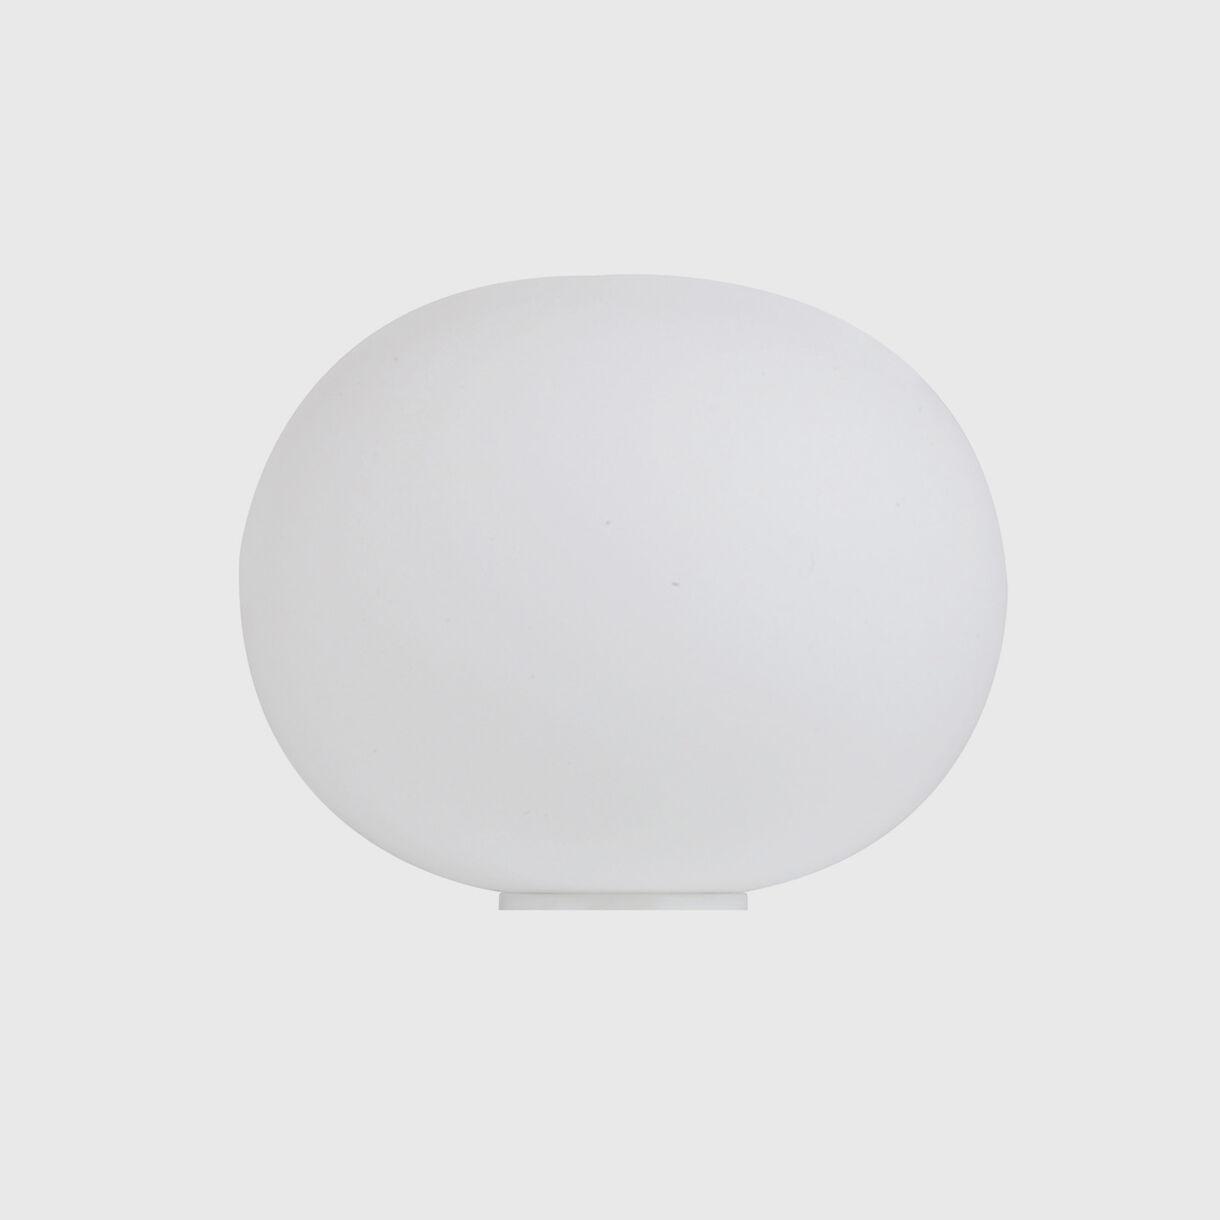 Glo-Ball Basic Table Lamp